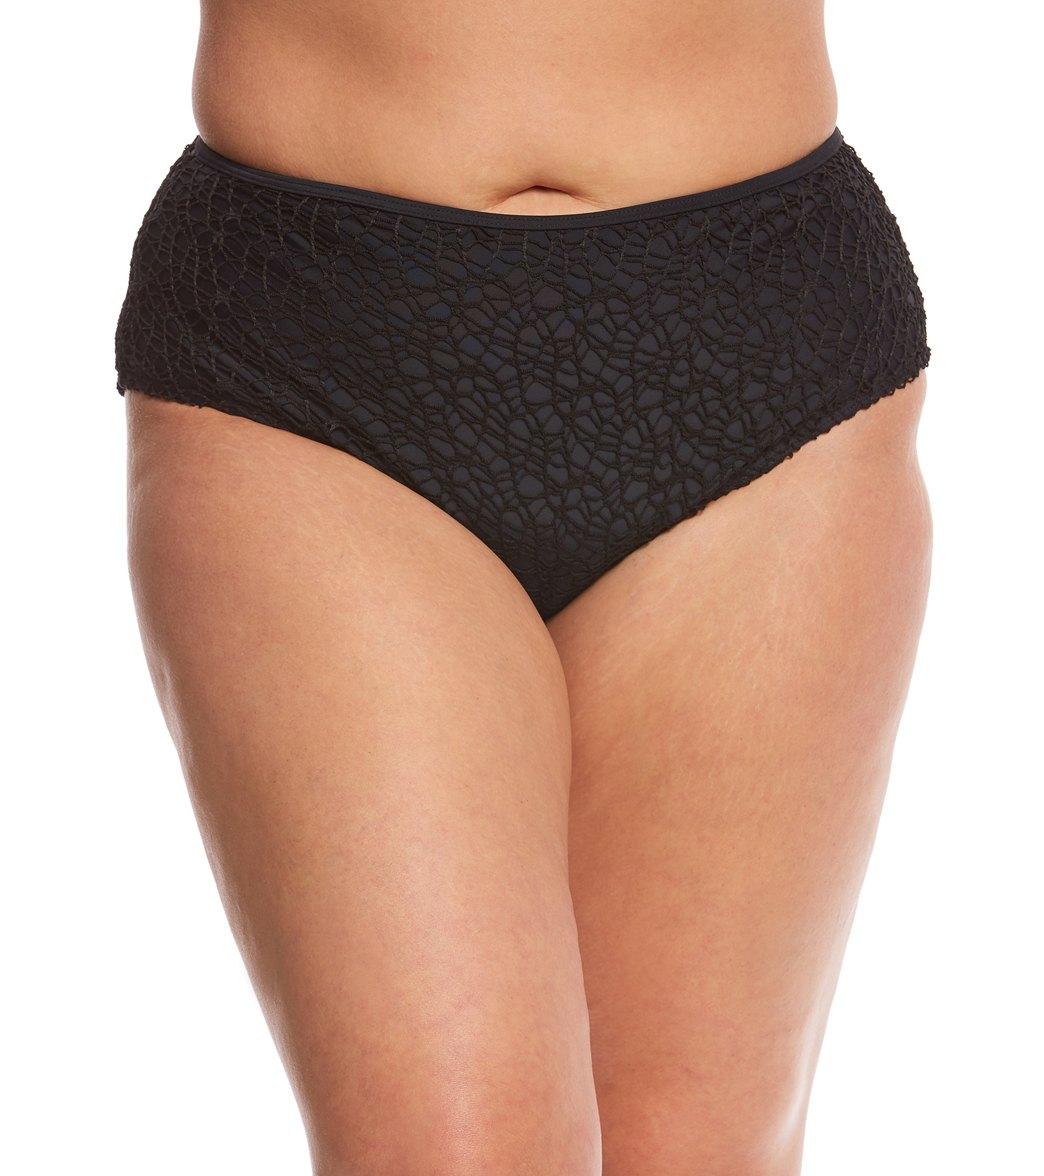 f5ac1df85c97e Paramour Plus Size Mykonos Solid High Waisted Bikini Bottom at  SwimOutlet.com